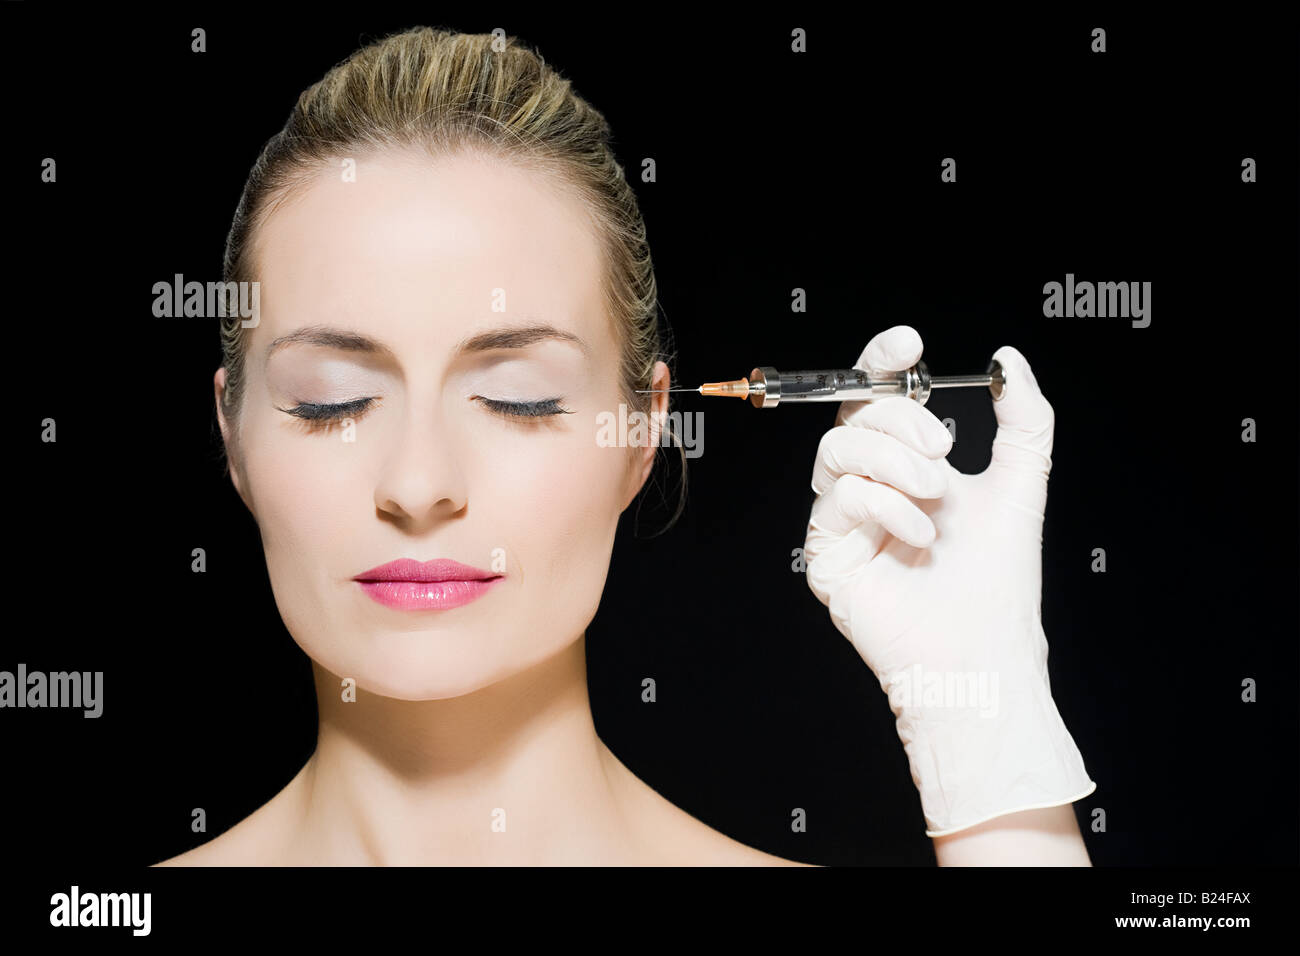 Woman having neurotoxin injection - Stock Image